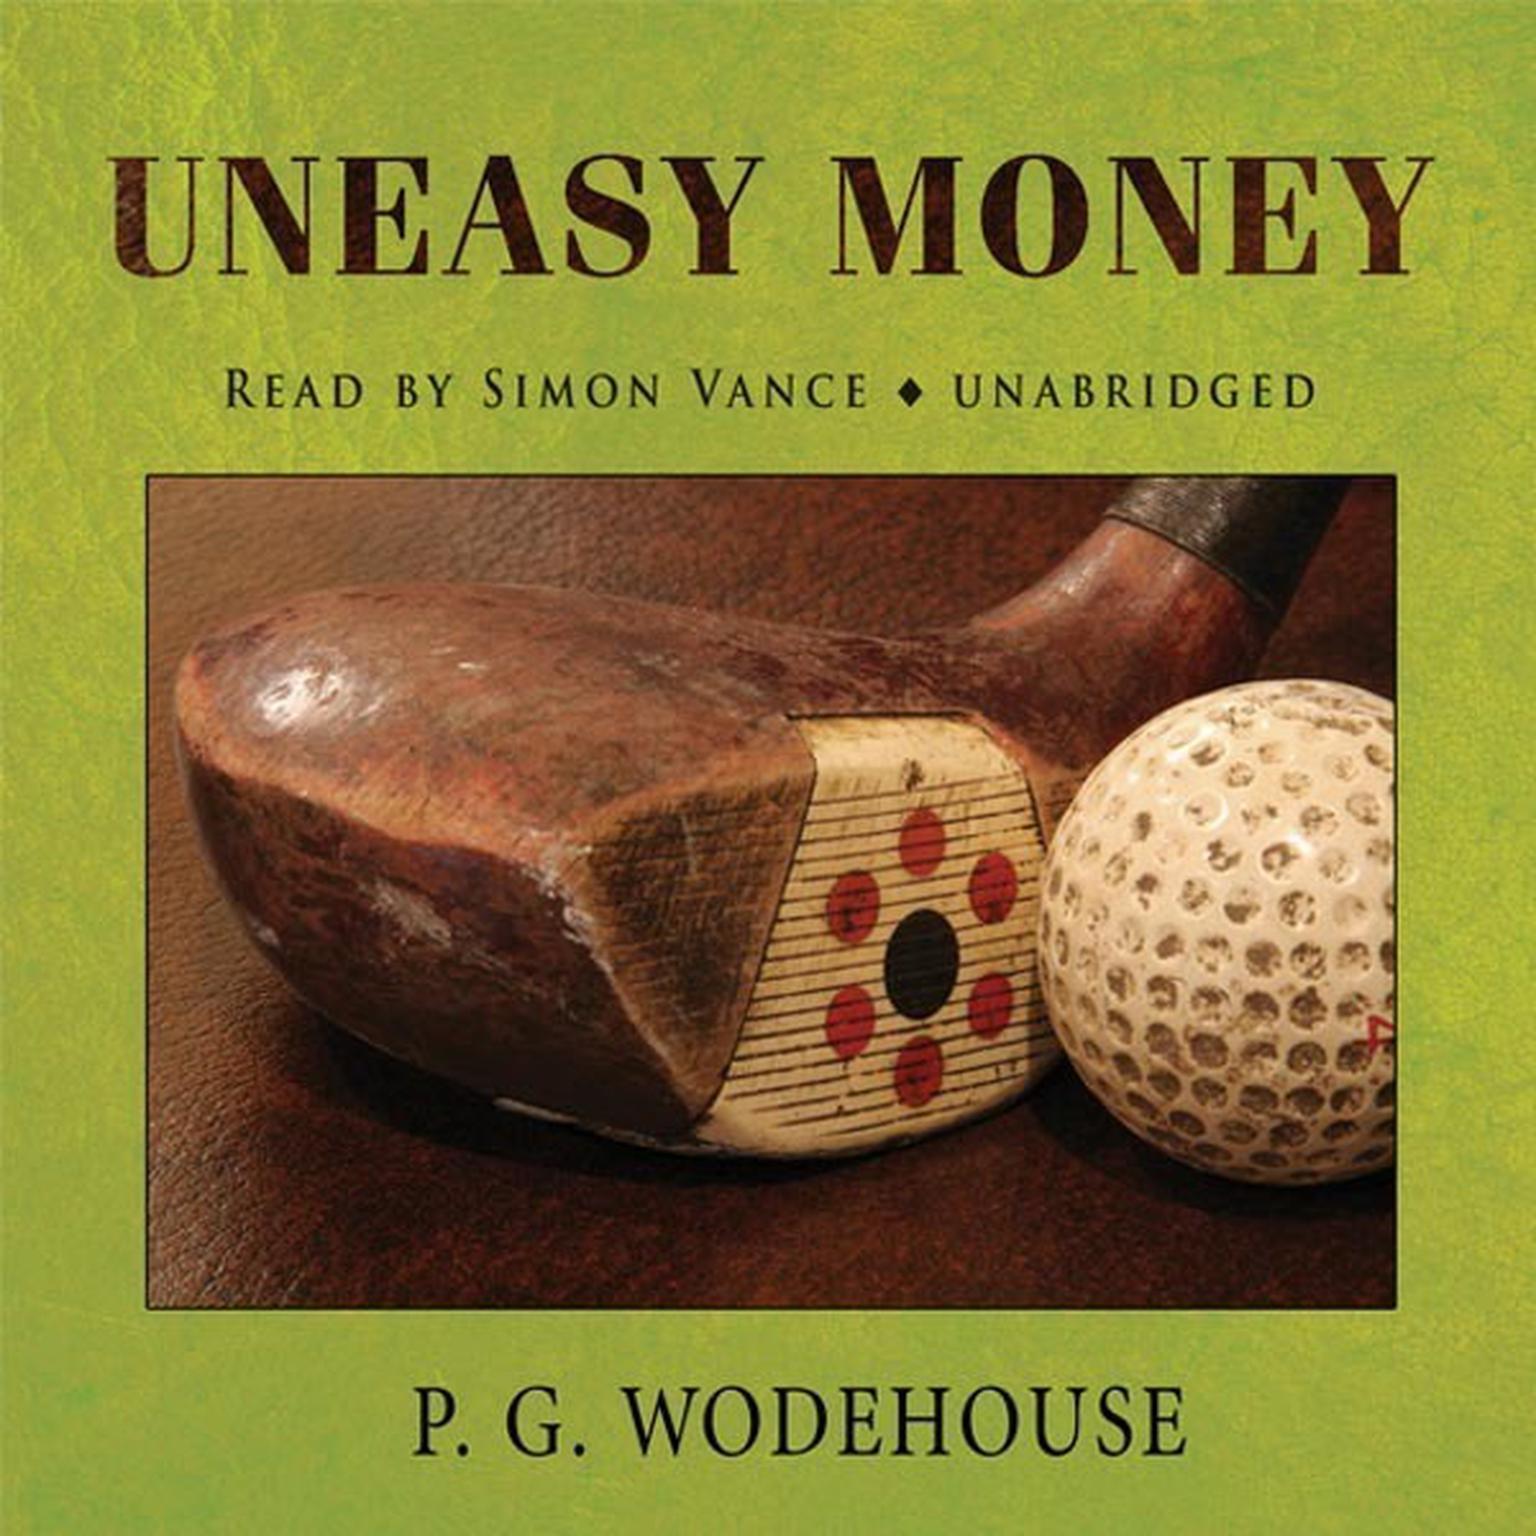 Printable Uneasy Money Audiobook Cover Art